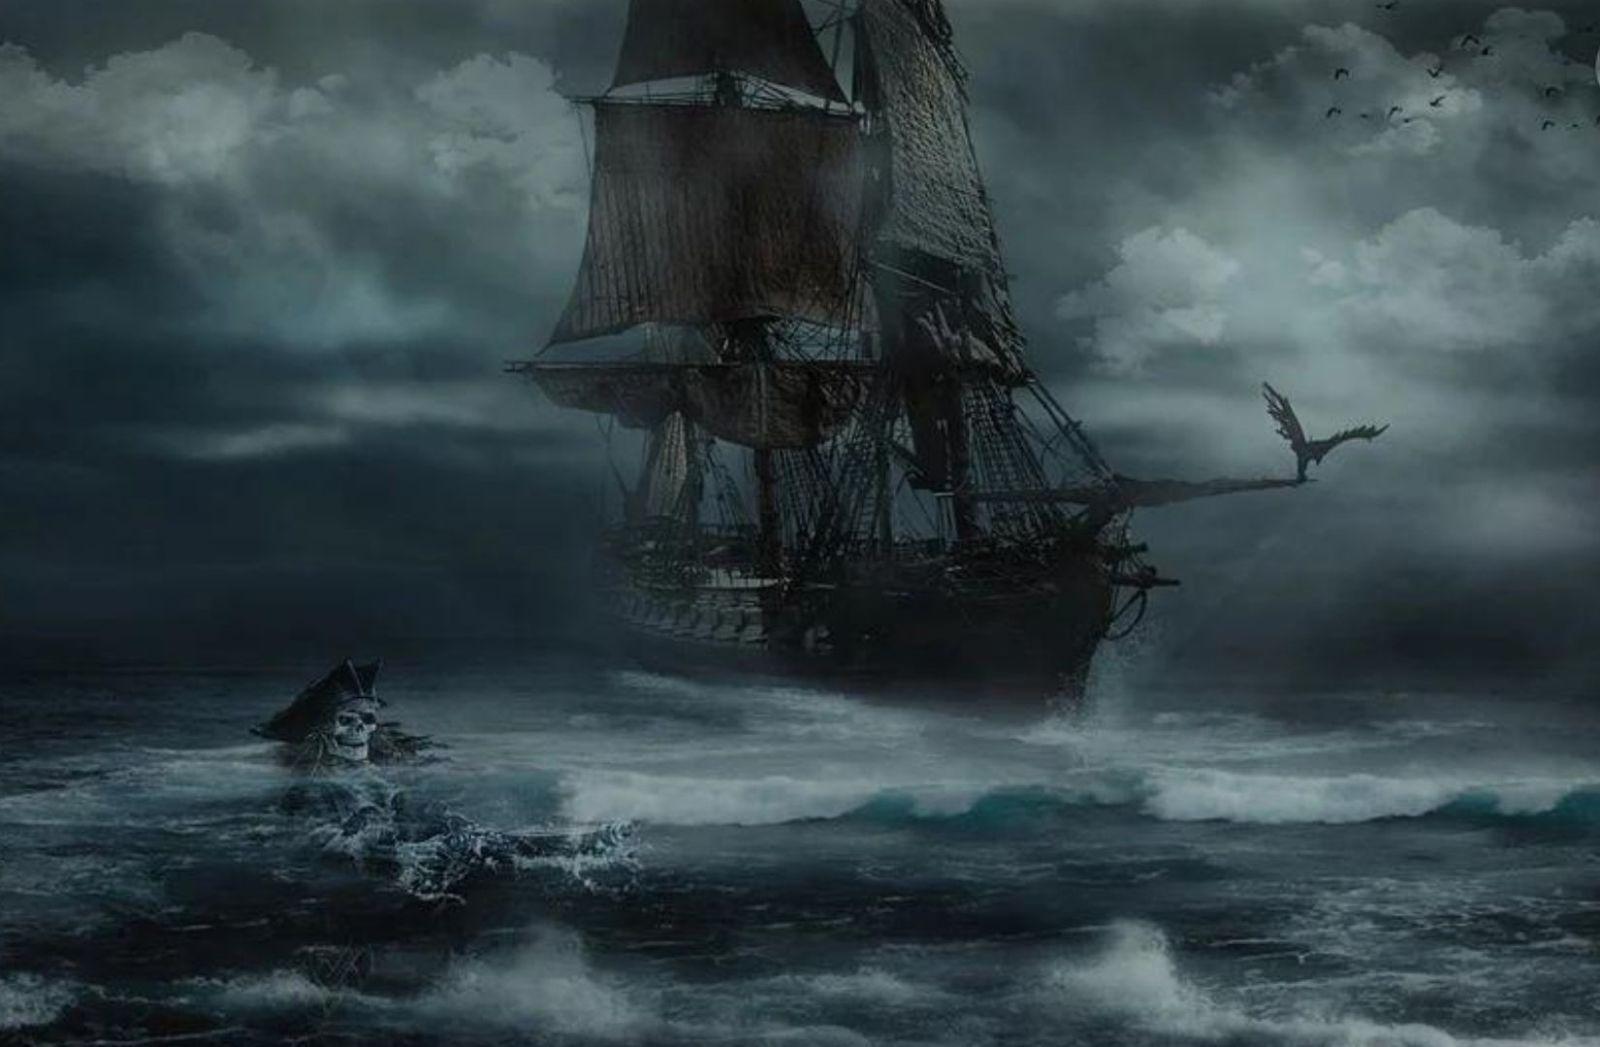 Piratenschiff im Sturm. (Illustration: Iván Tamás, Pixabay.com)